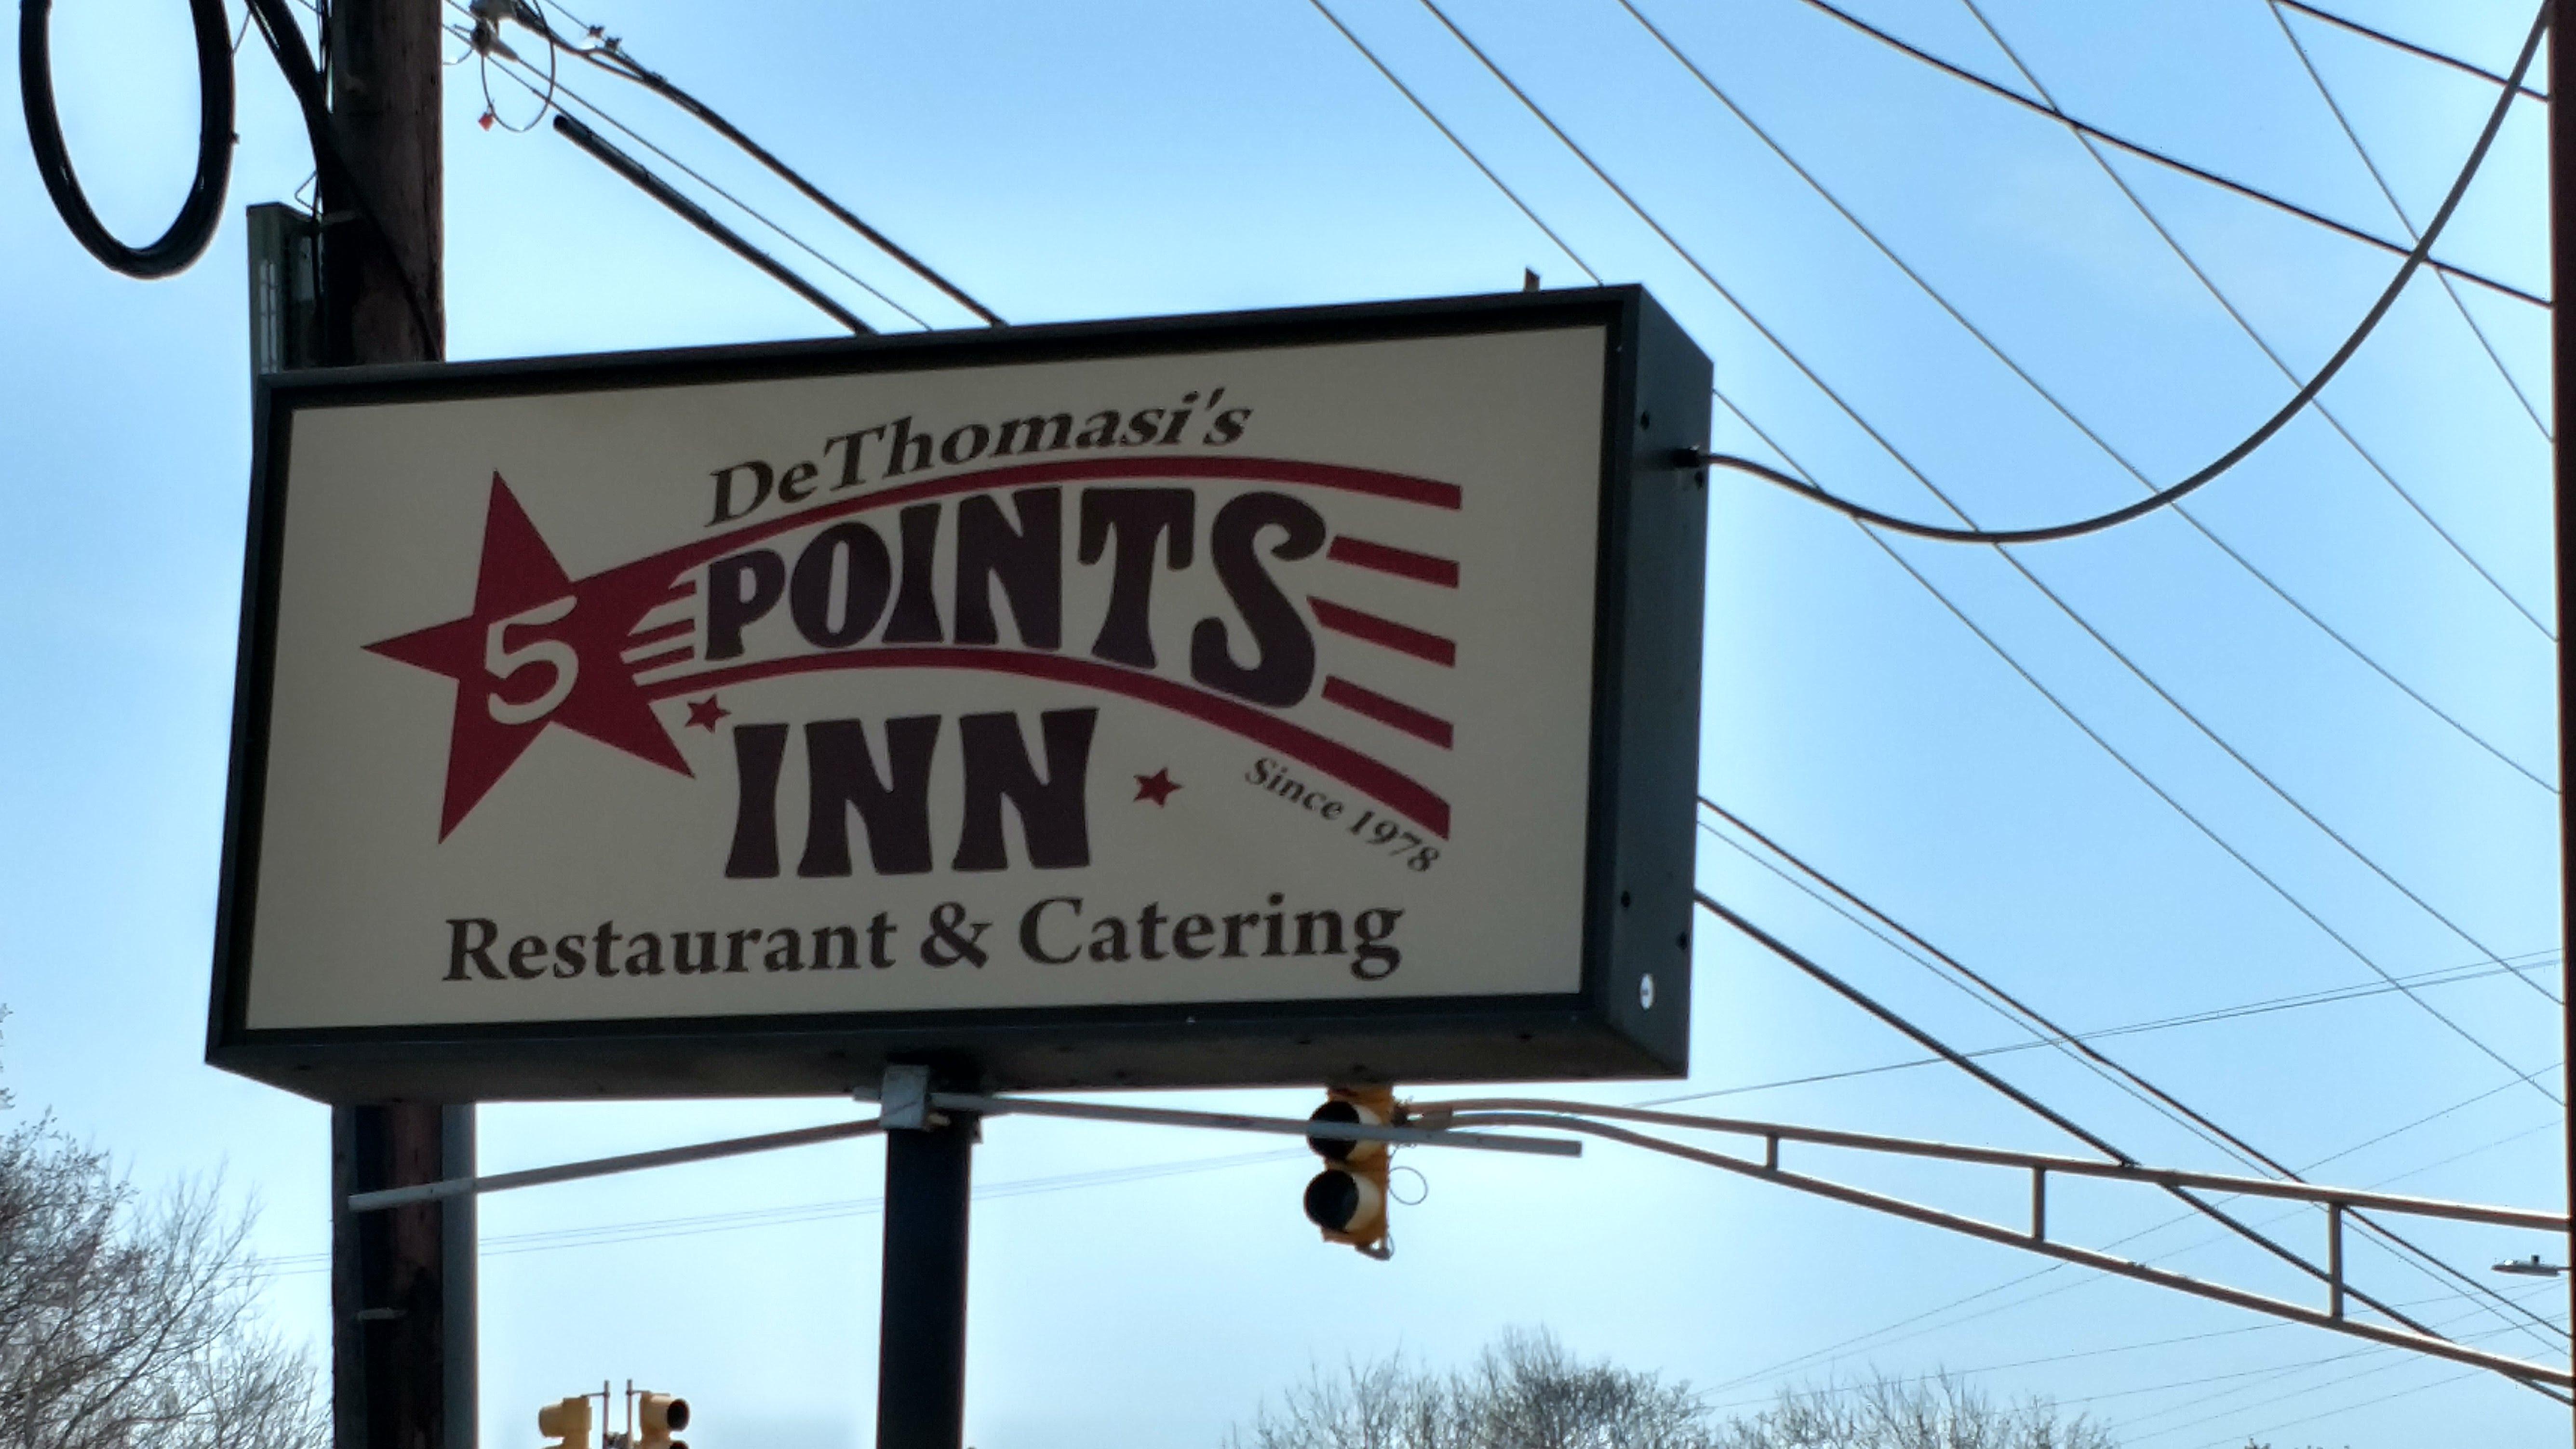 Five Points Inn Hall Rentals In Vineland Nj